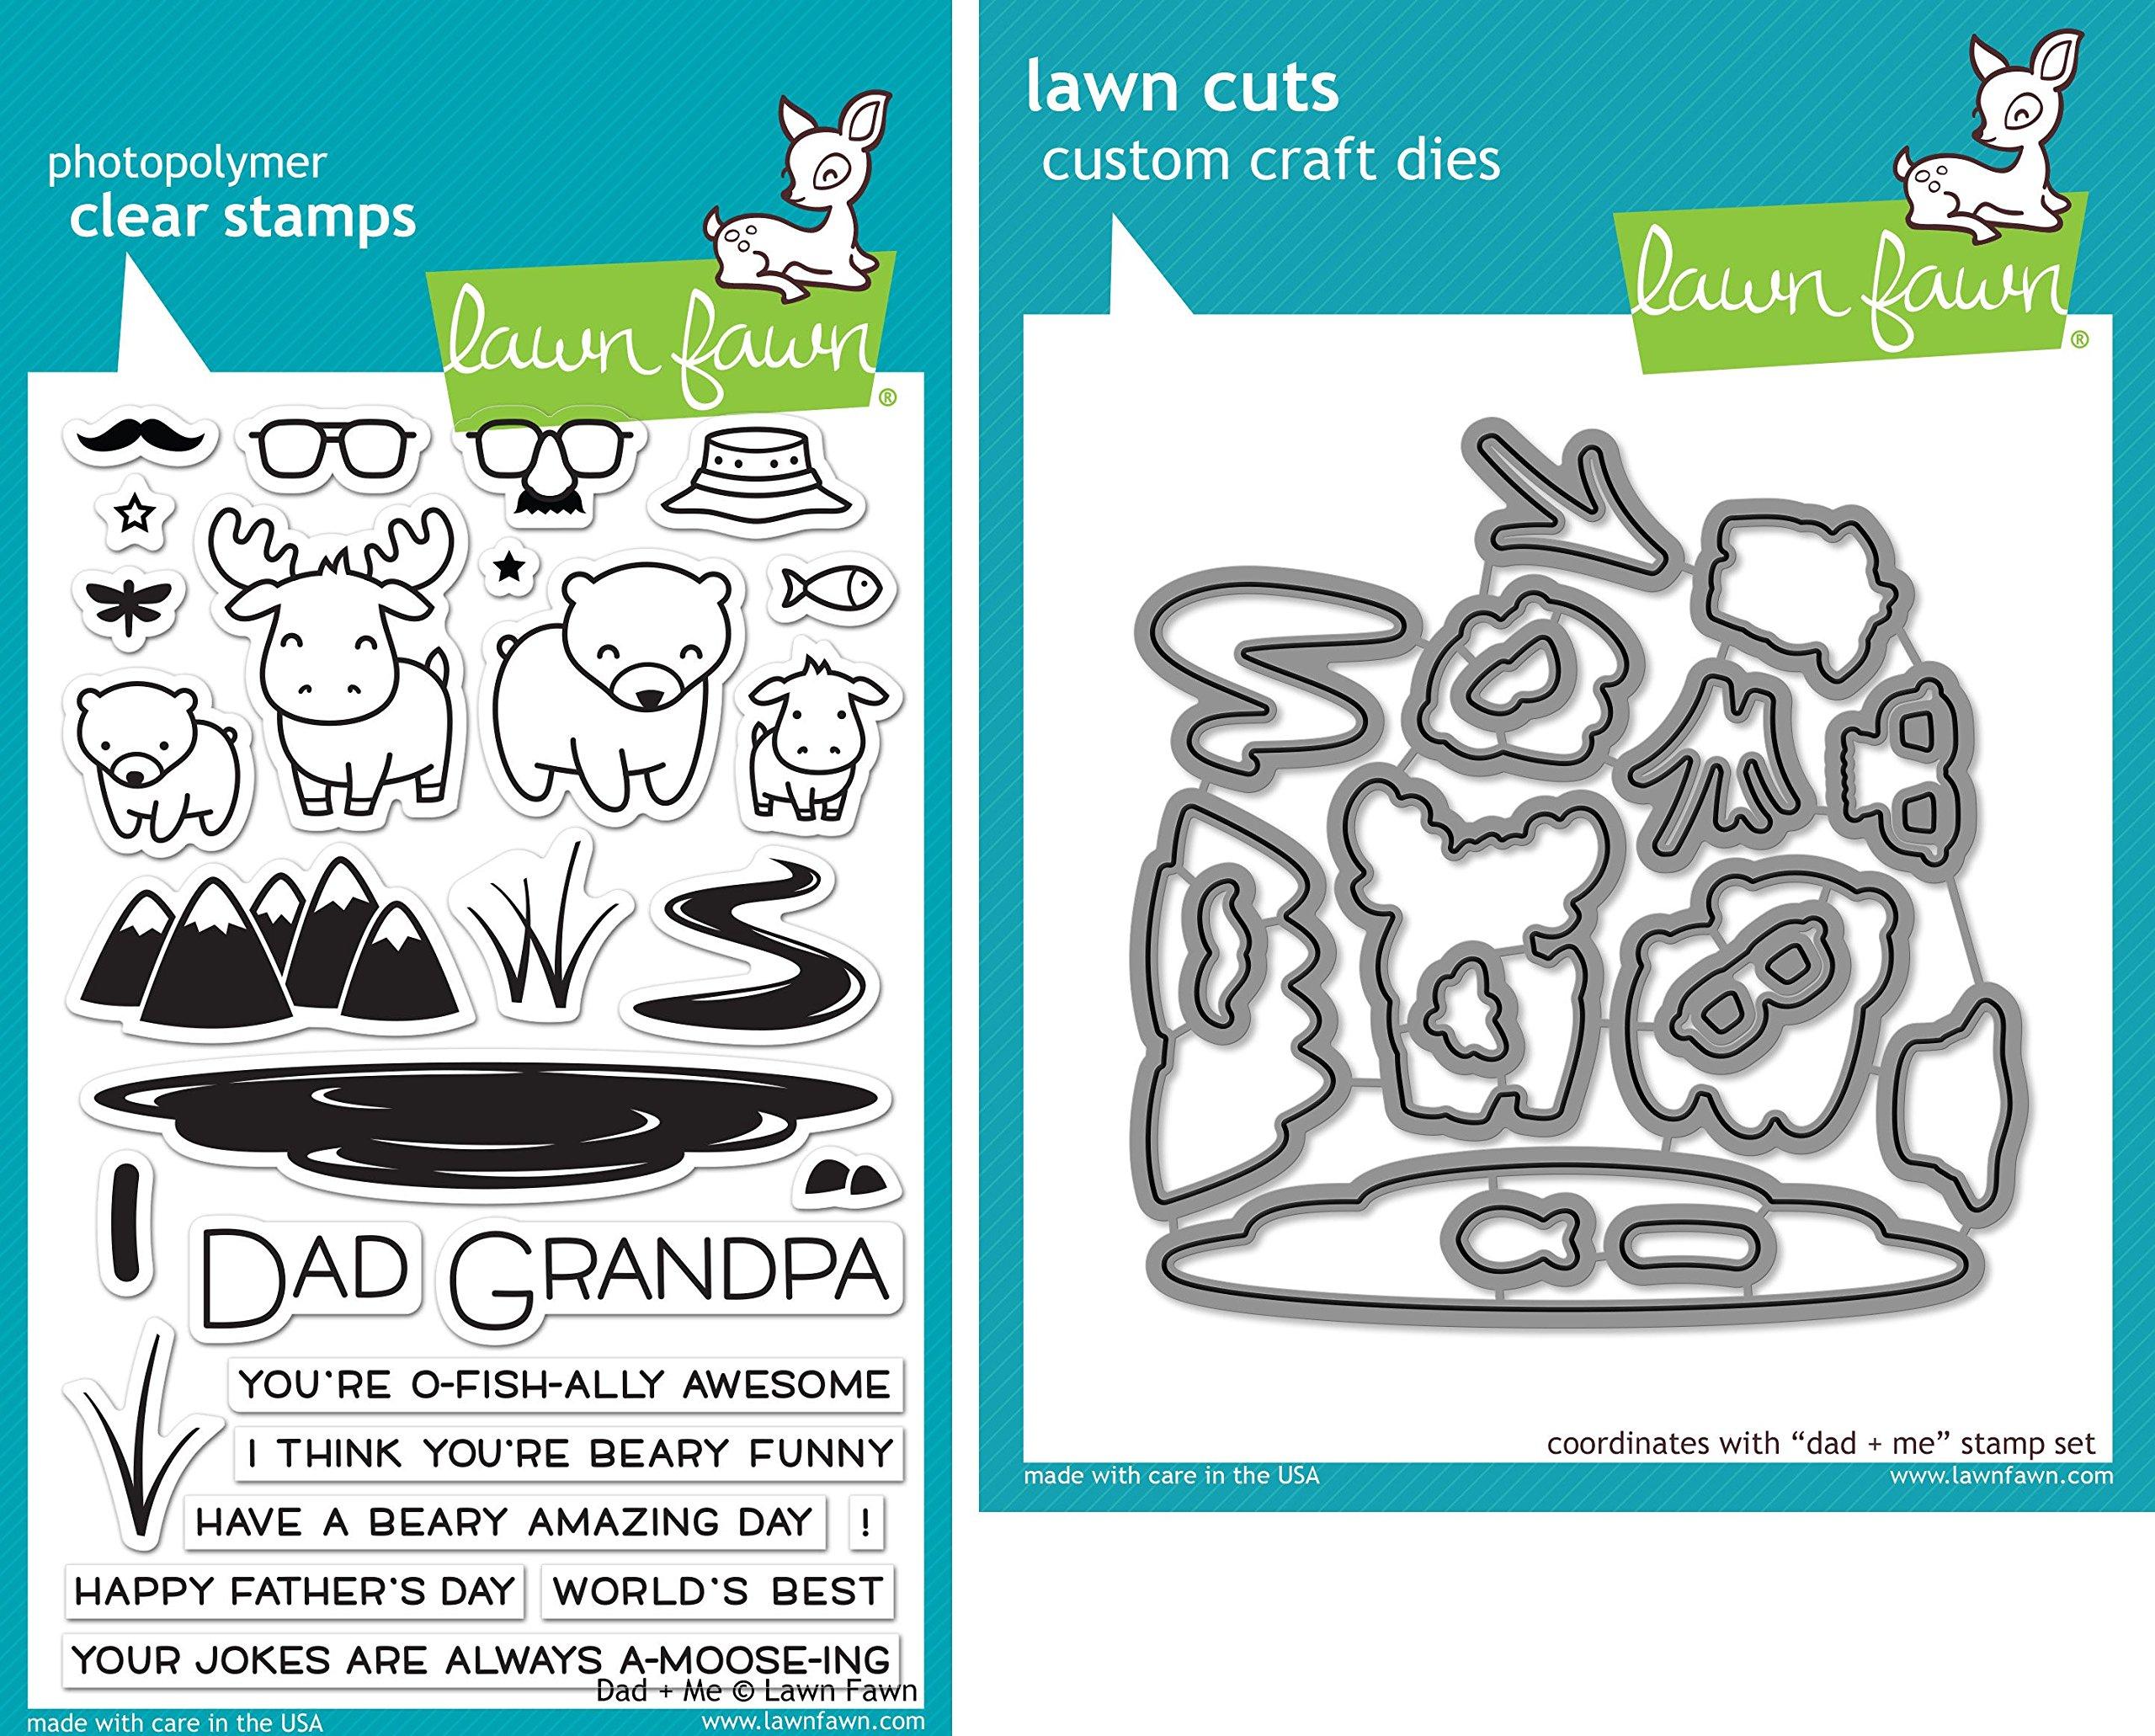 Lawn Fawn Dad + Me Stamp and Die Set - Two item Bundle